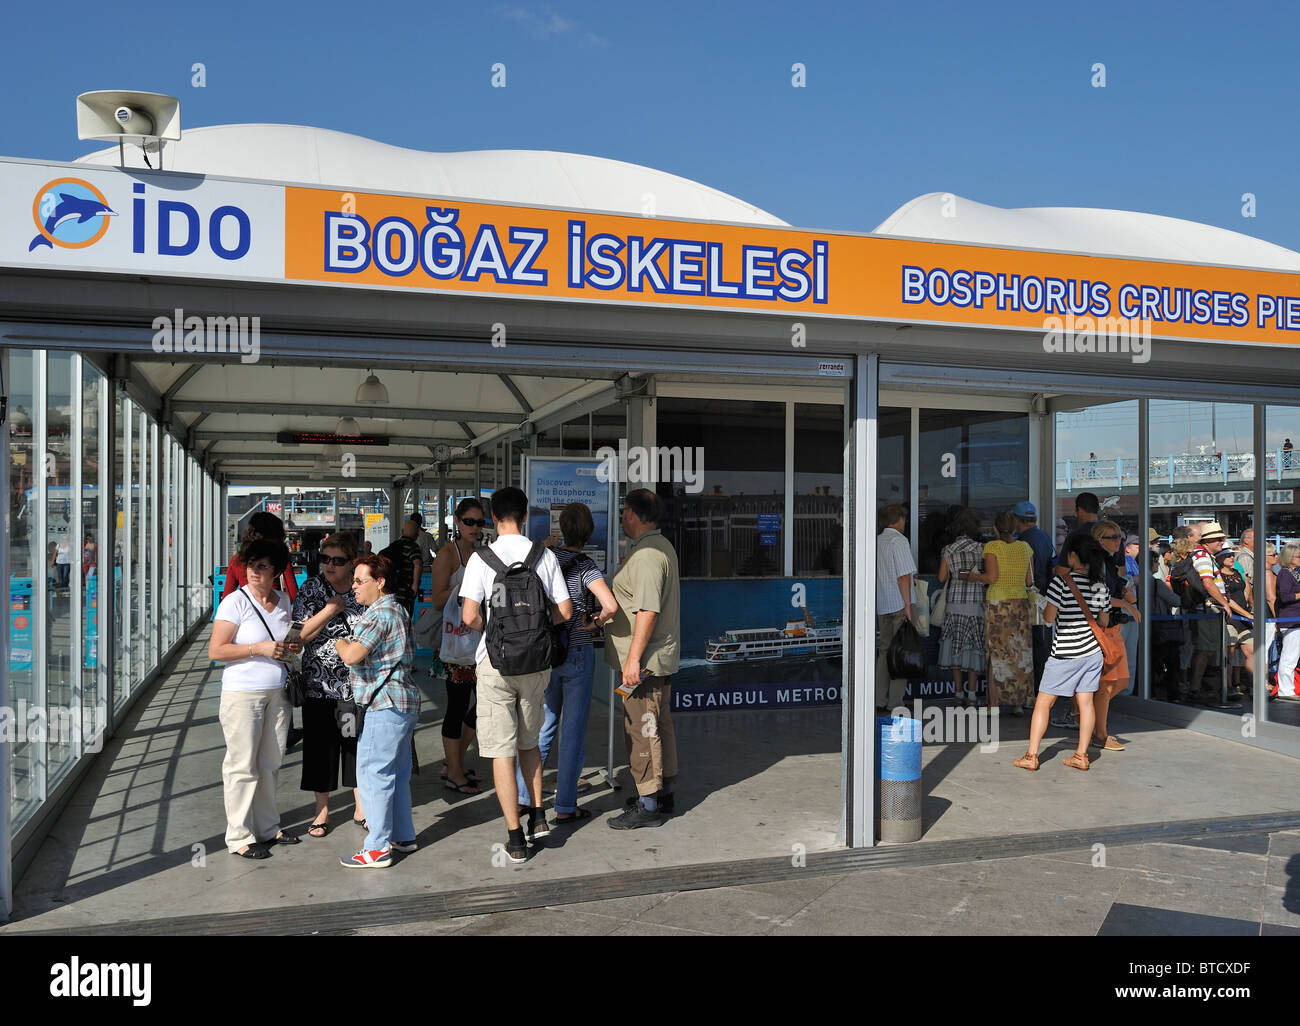 People waiting at the Bosphorus Cruises Pier, İstanbul, Turkey 100916_35980 - Stock Image